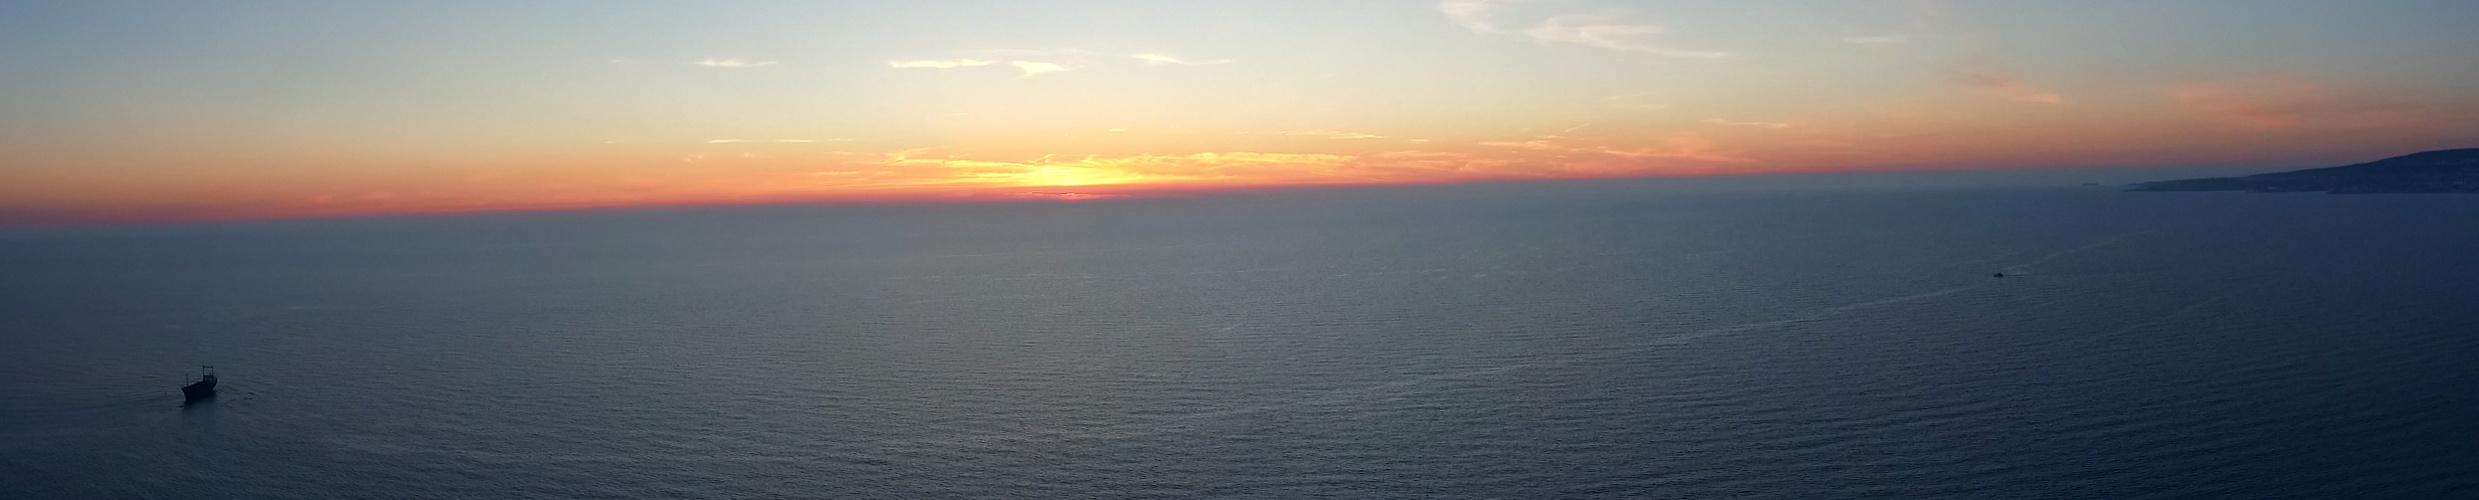 Pafos Schiffwrack panorama am Sonnenuntergang